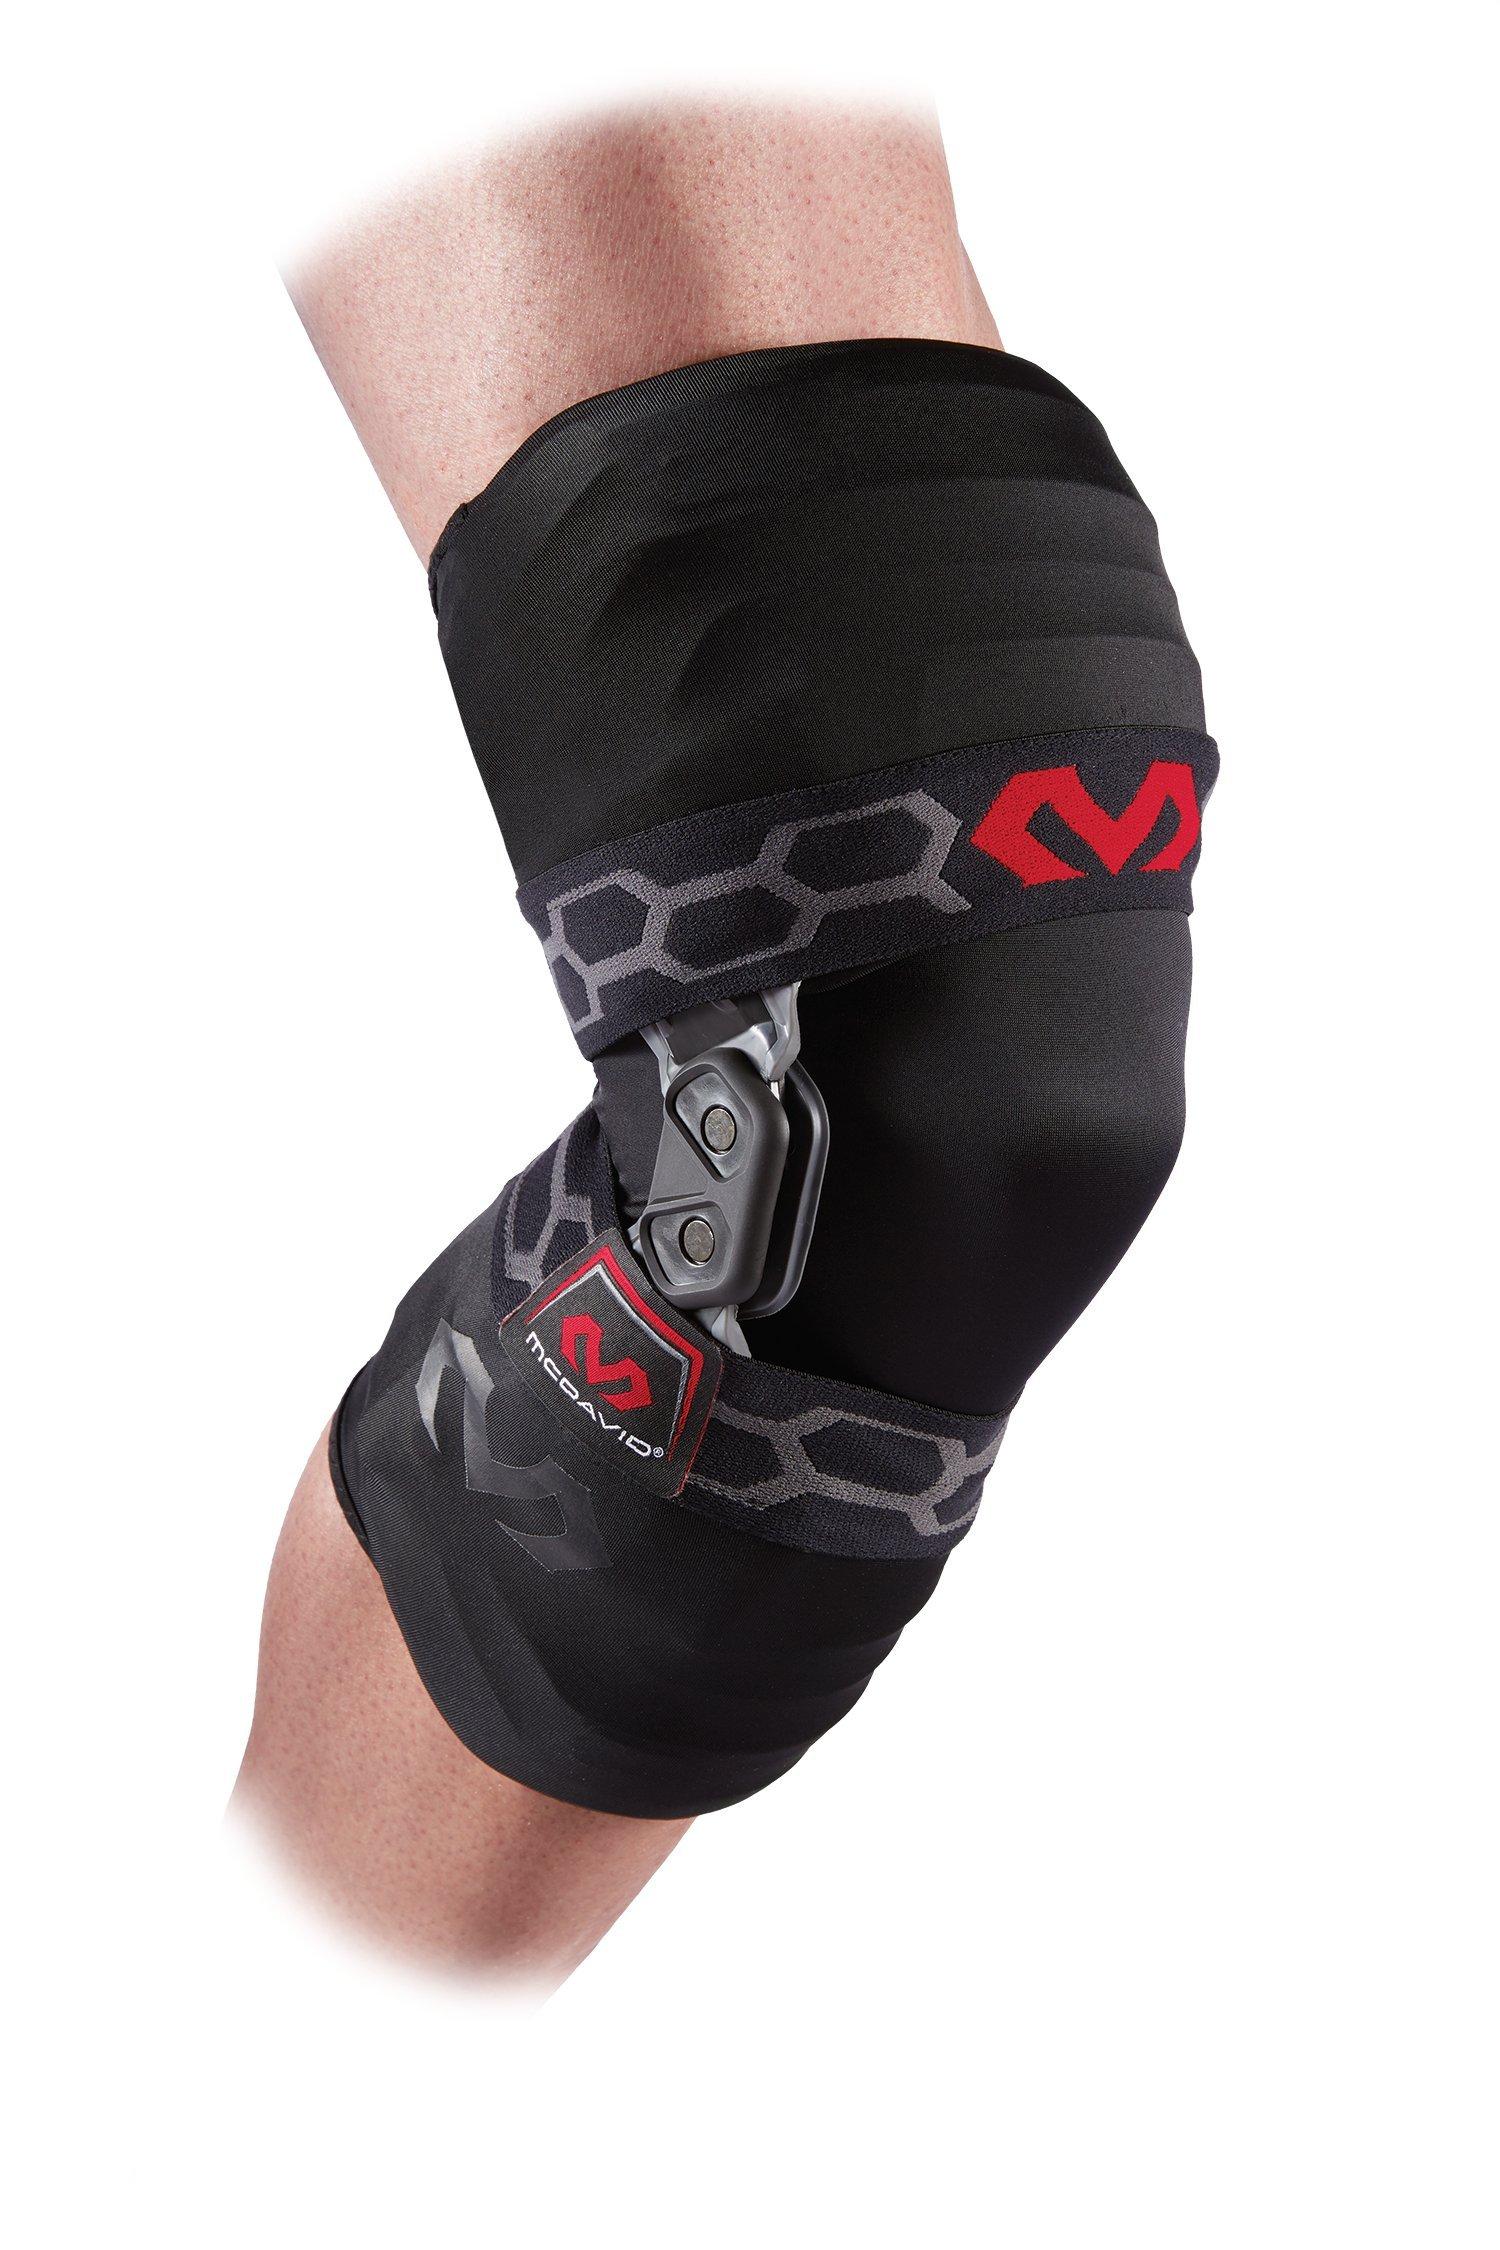 McDavid Bio-Logix Knee Brace, Black, Medium, Left